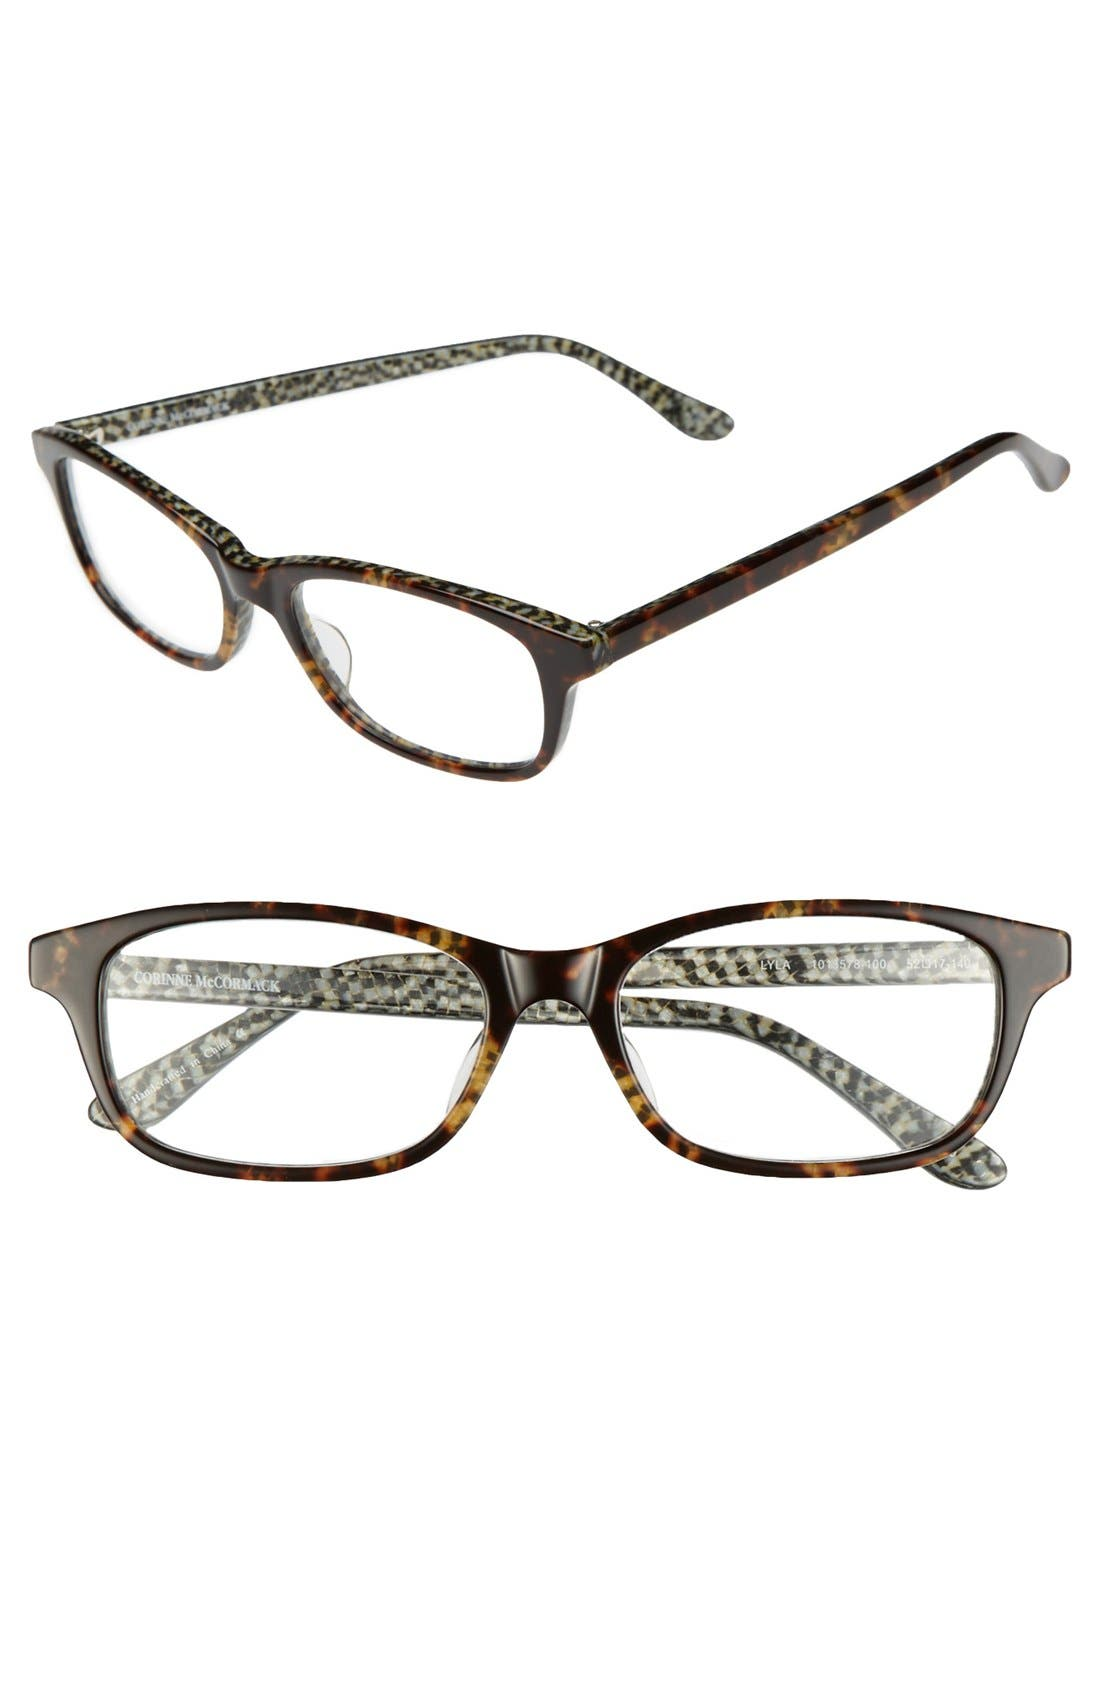 Main Image - Corinne McCormack 'Lyla' 52mm Reading Glasses